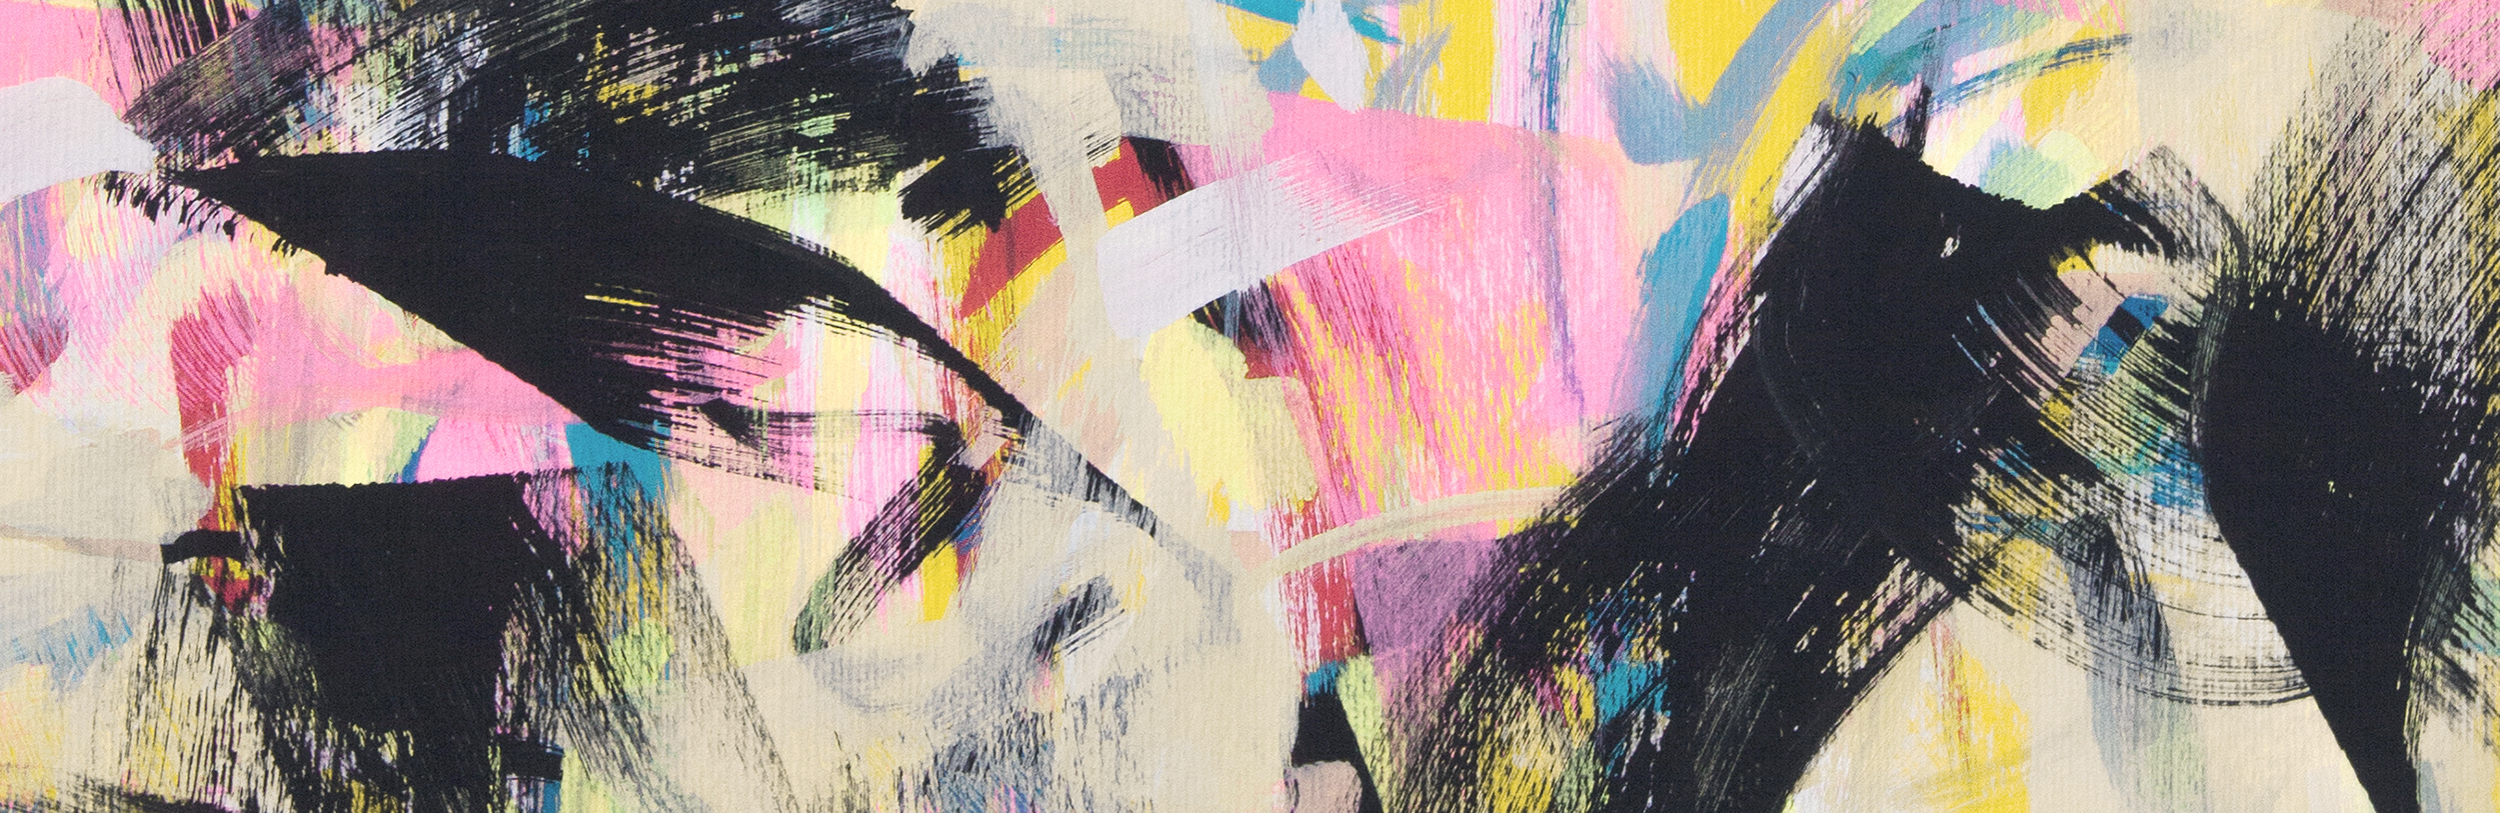 bonjourmolotov+So+Illustration+Ilustracao+painting+pintura+acrylic+acrílico+canvas+tela+paper+cardboard+mdf+Andre+Gigante+04N4.jpg